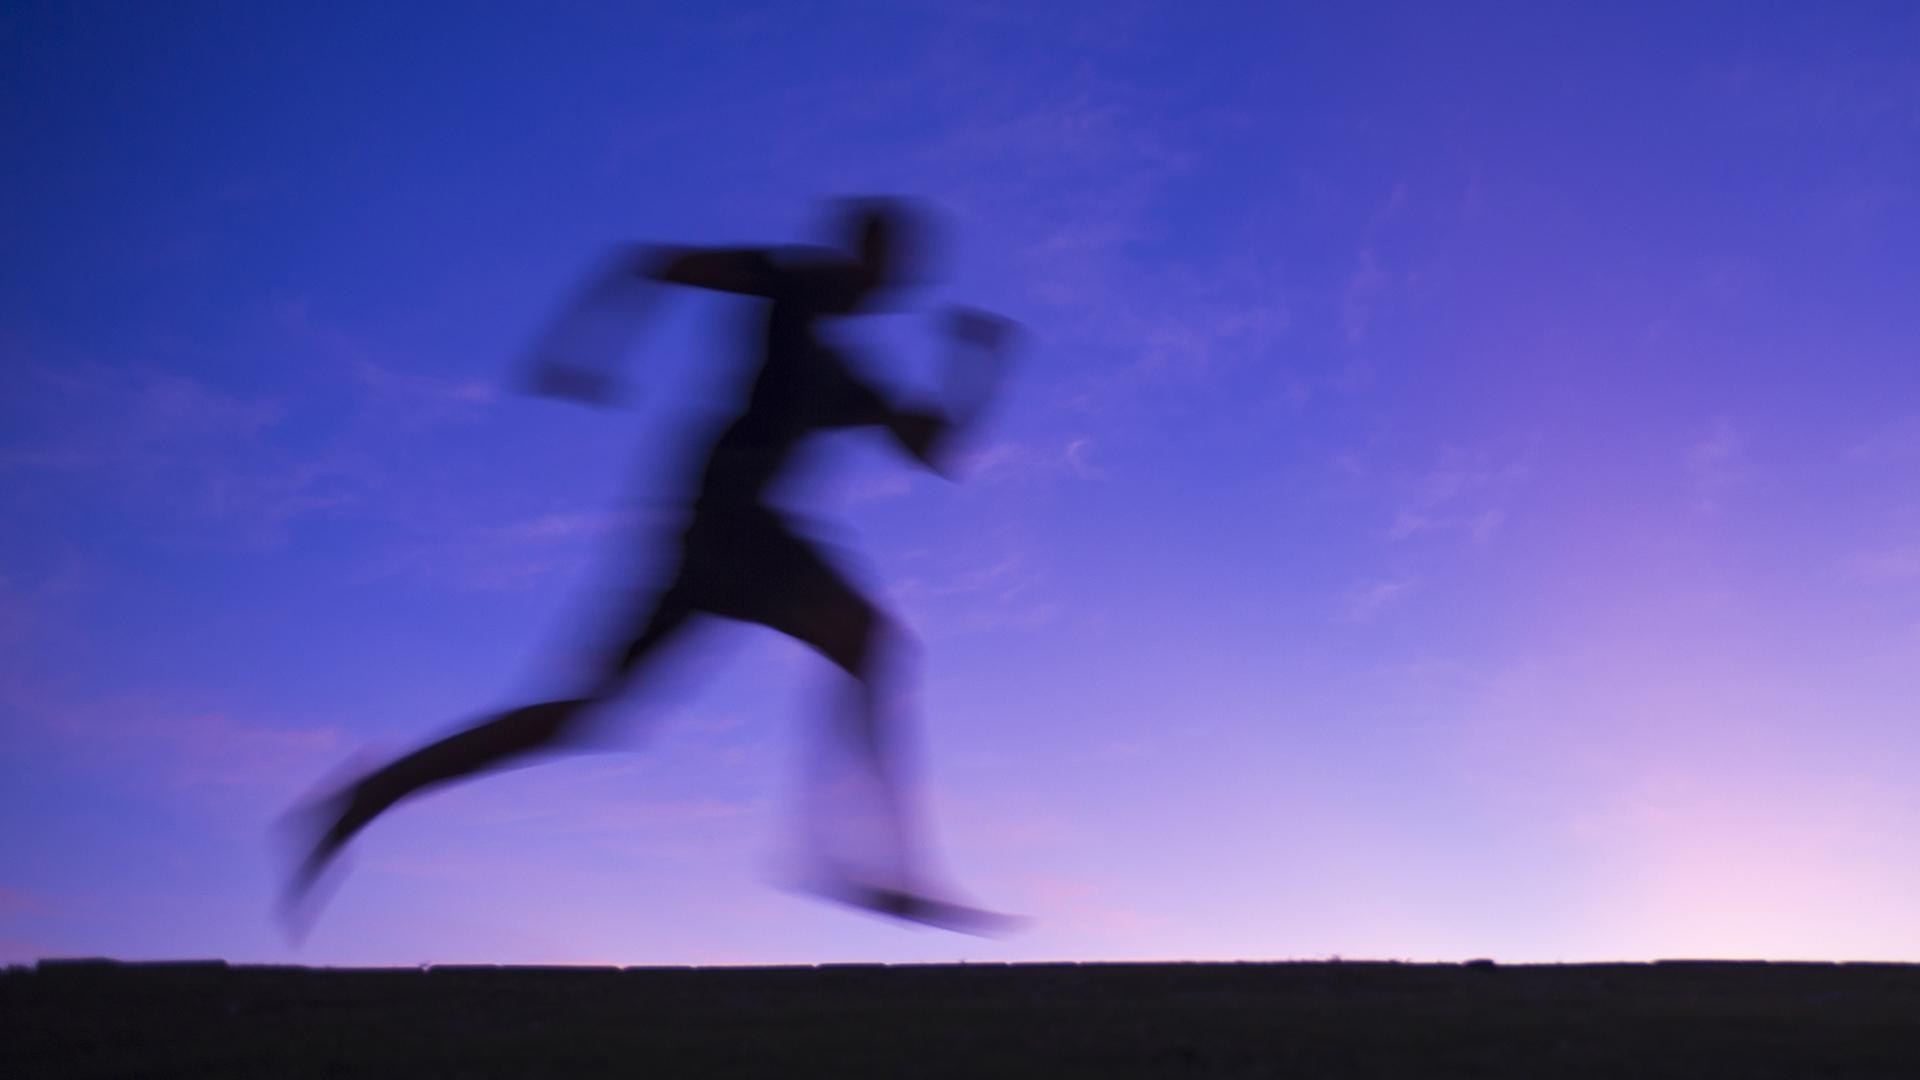 WellbeingHub exercisewellbeing